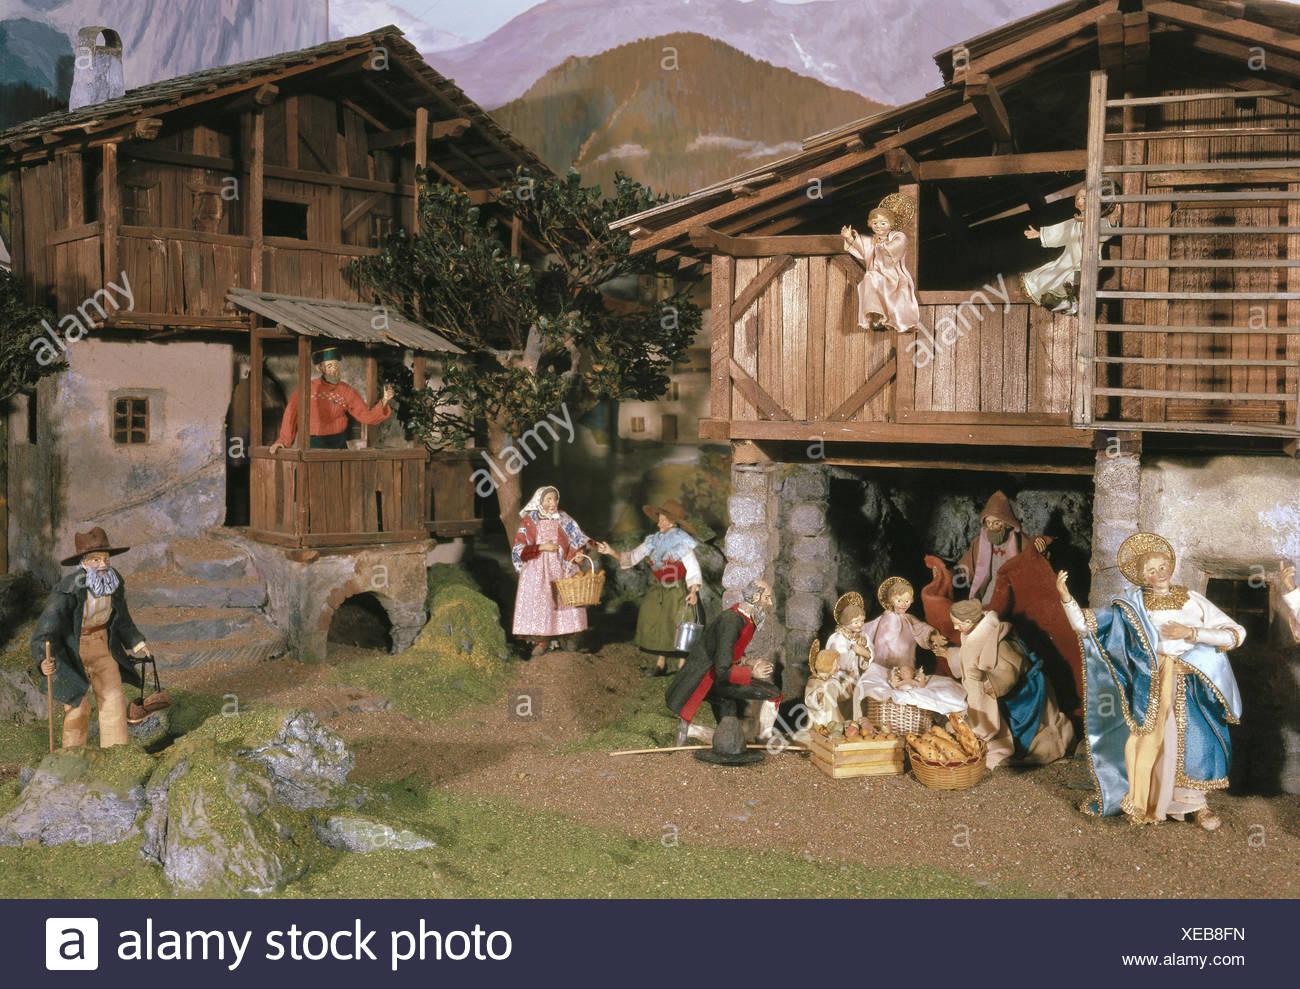 Austria Tyrol Thaur Creche Christmas Yule Tide Decoration